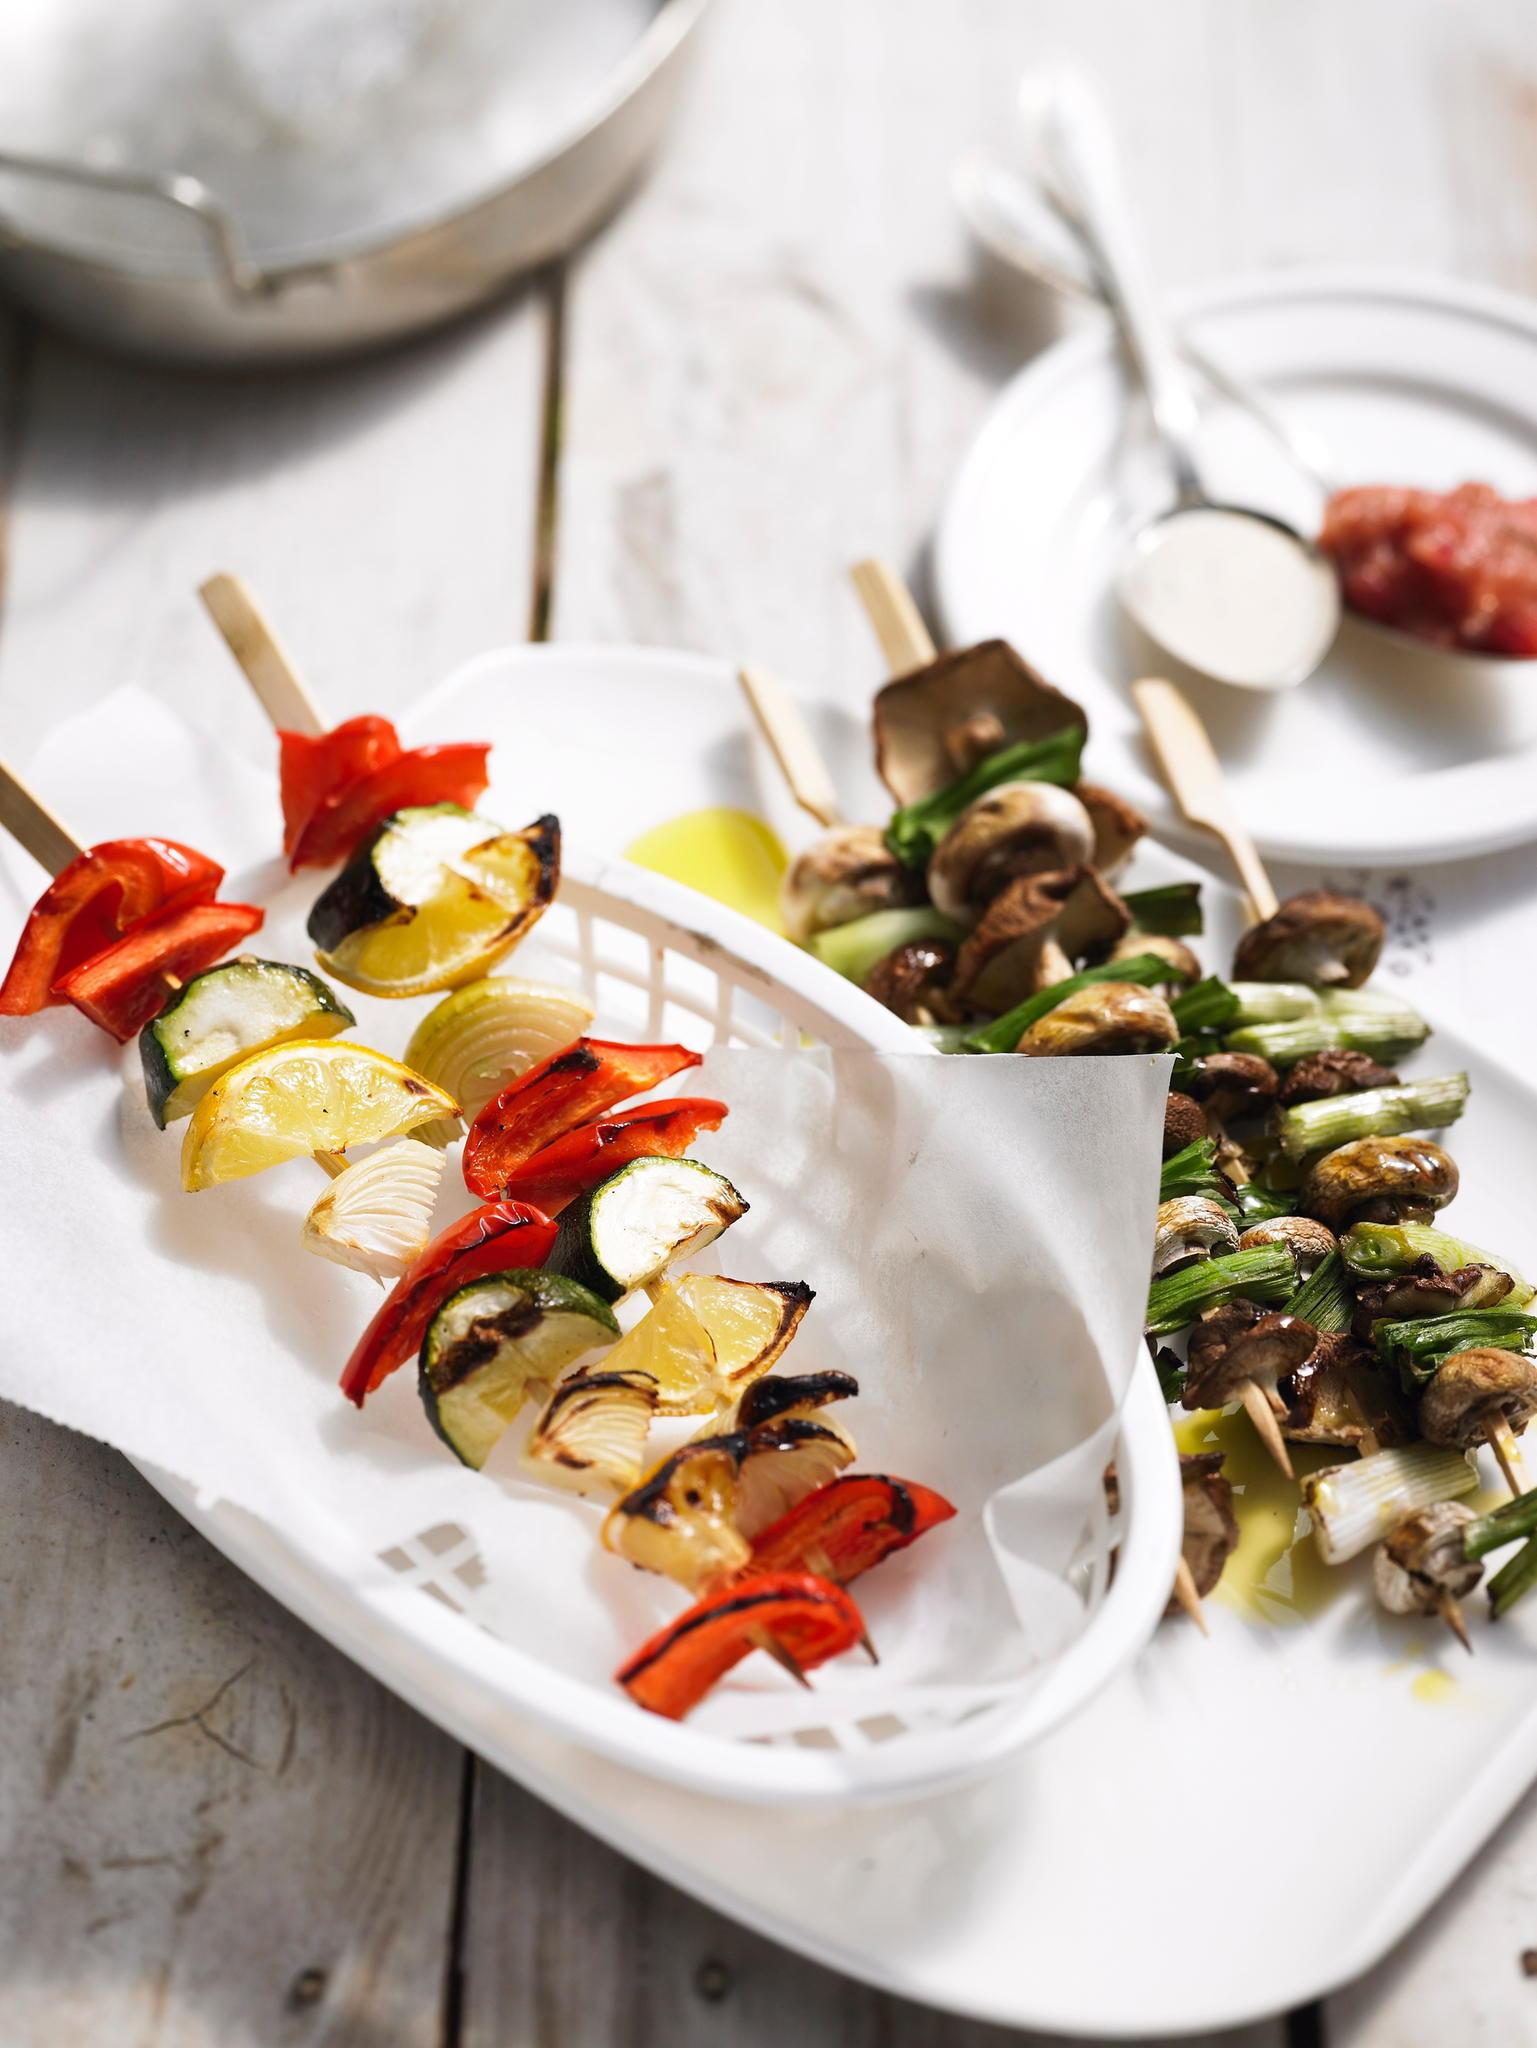 grillen vegetarisch grillen die besten rezepte. Black Bedroom Furniture Sets. Home Design Ideas